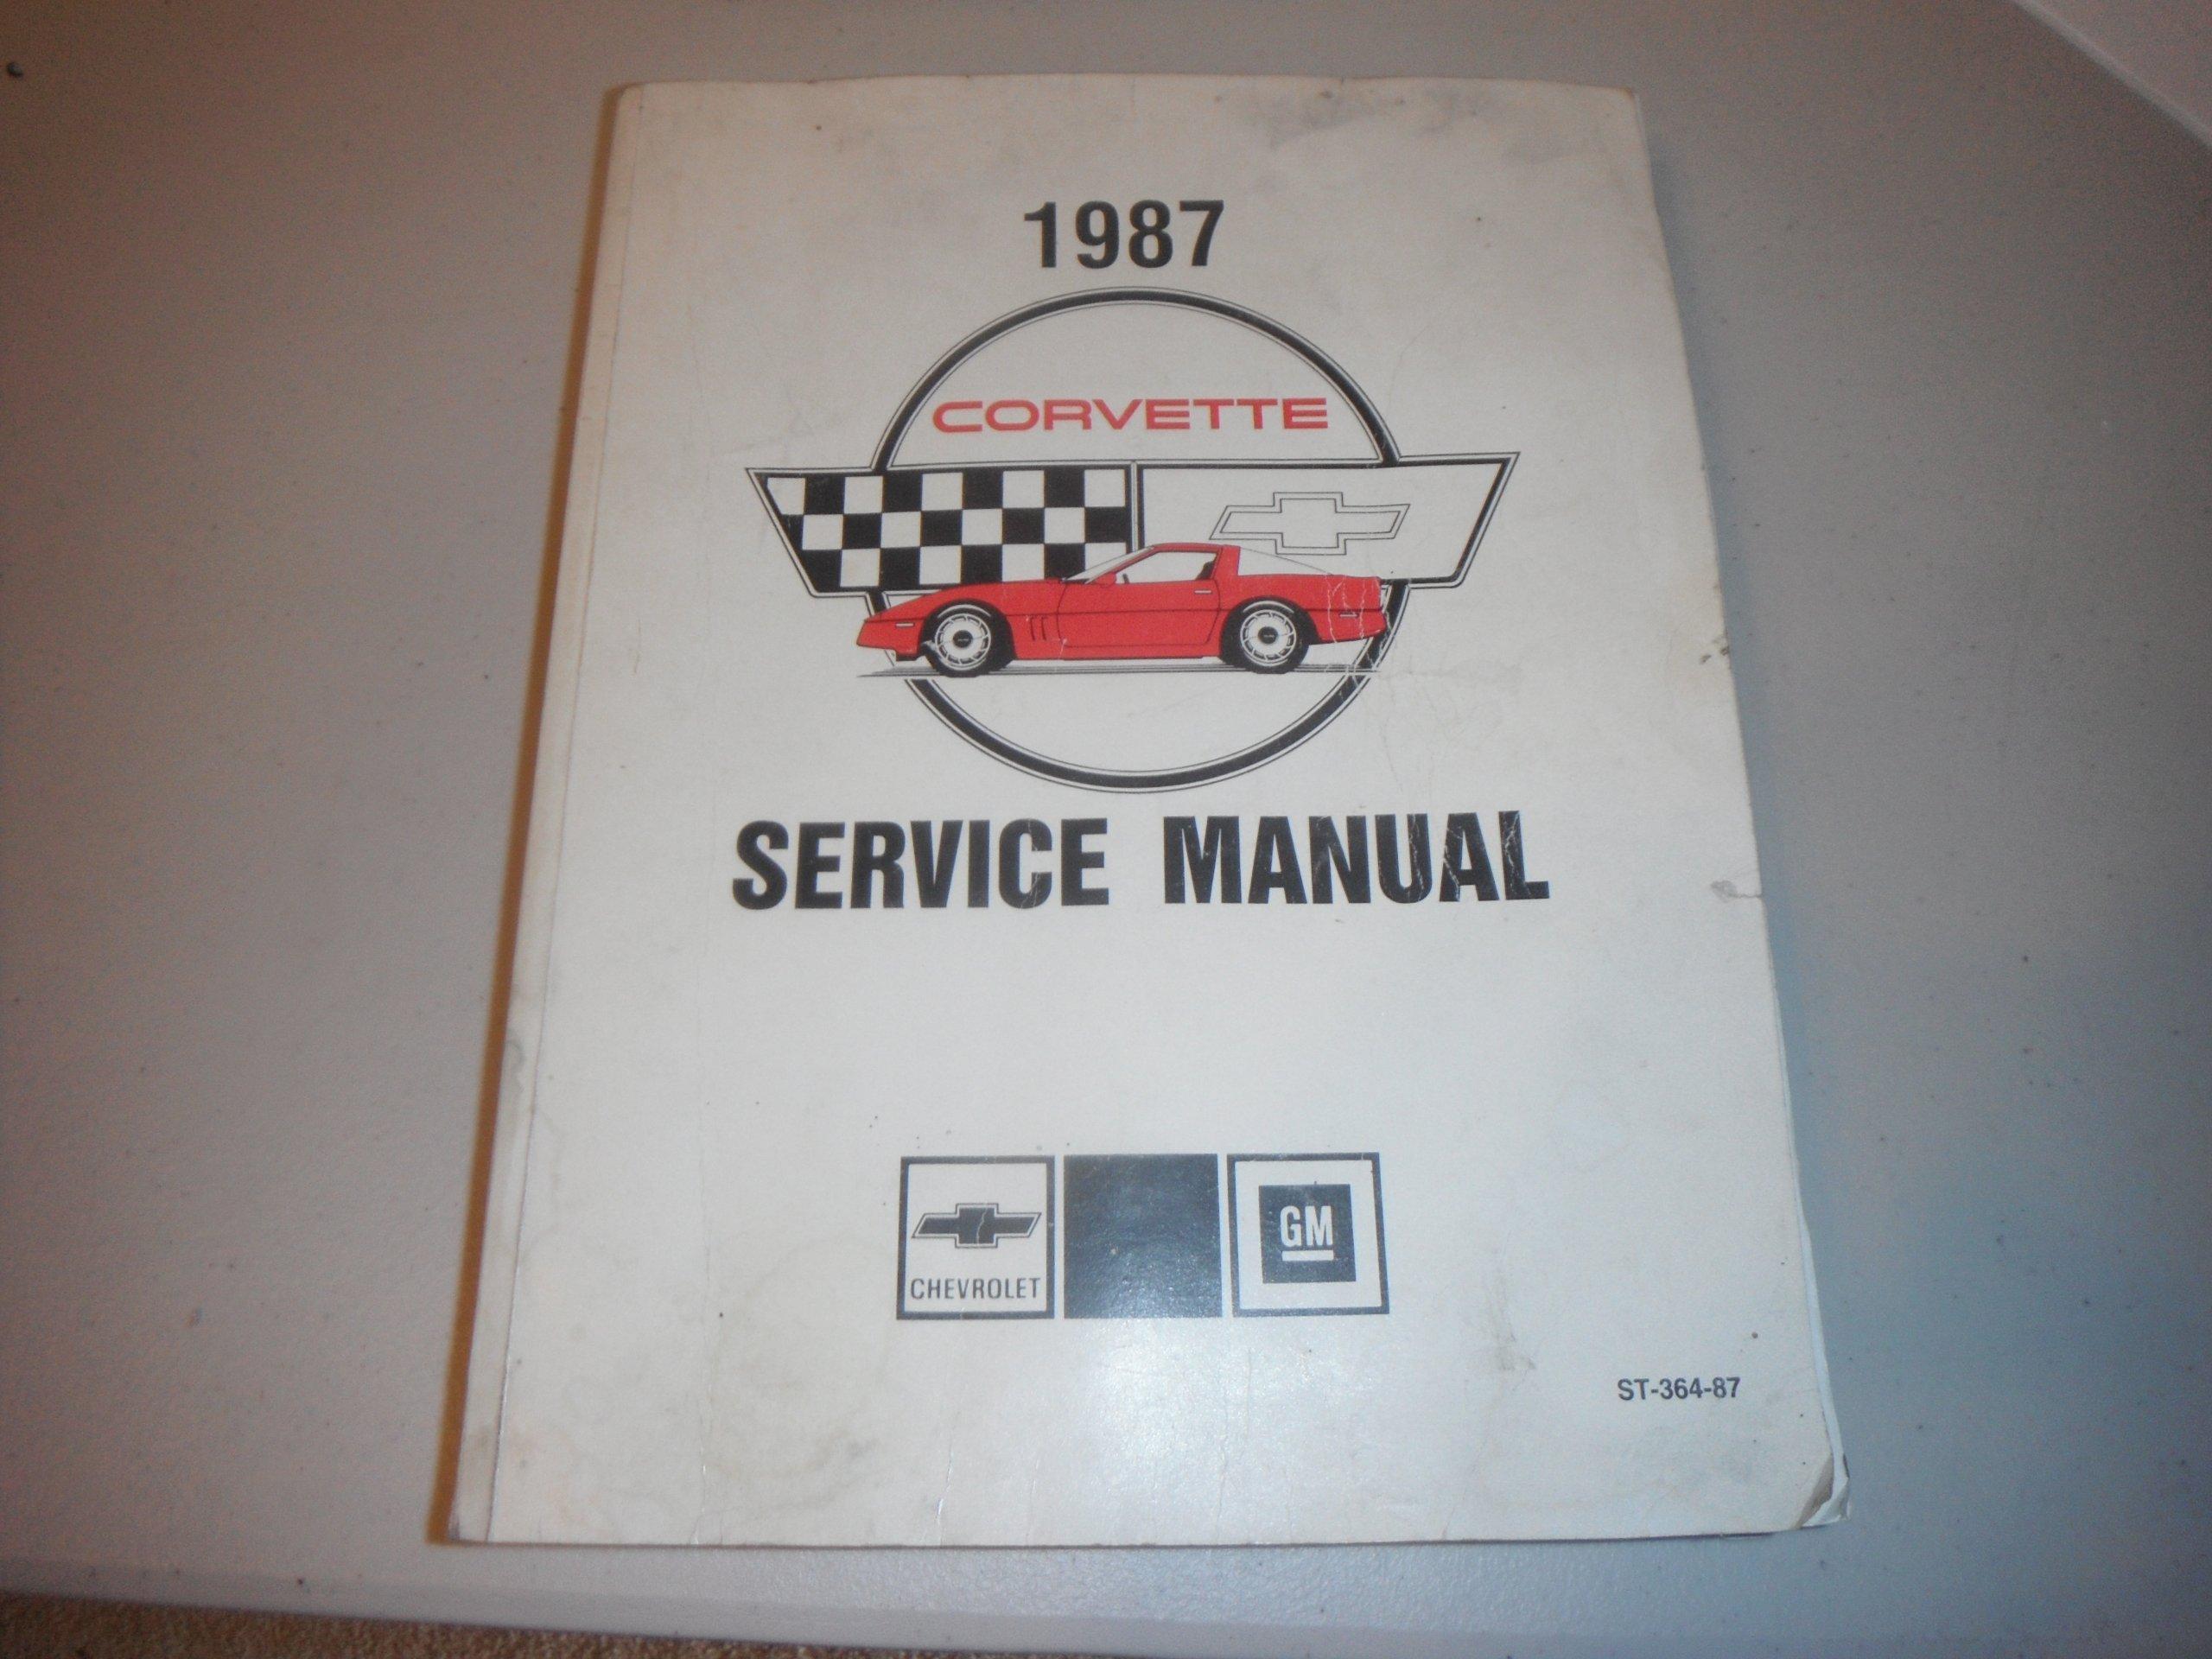 1987 corvette service manual st 364 87 amazon com books rh amazon com 1978 Corvette 1992 Corvette